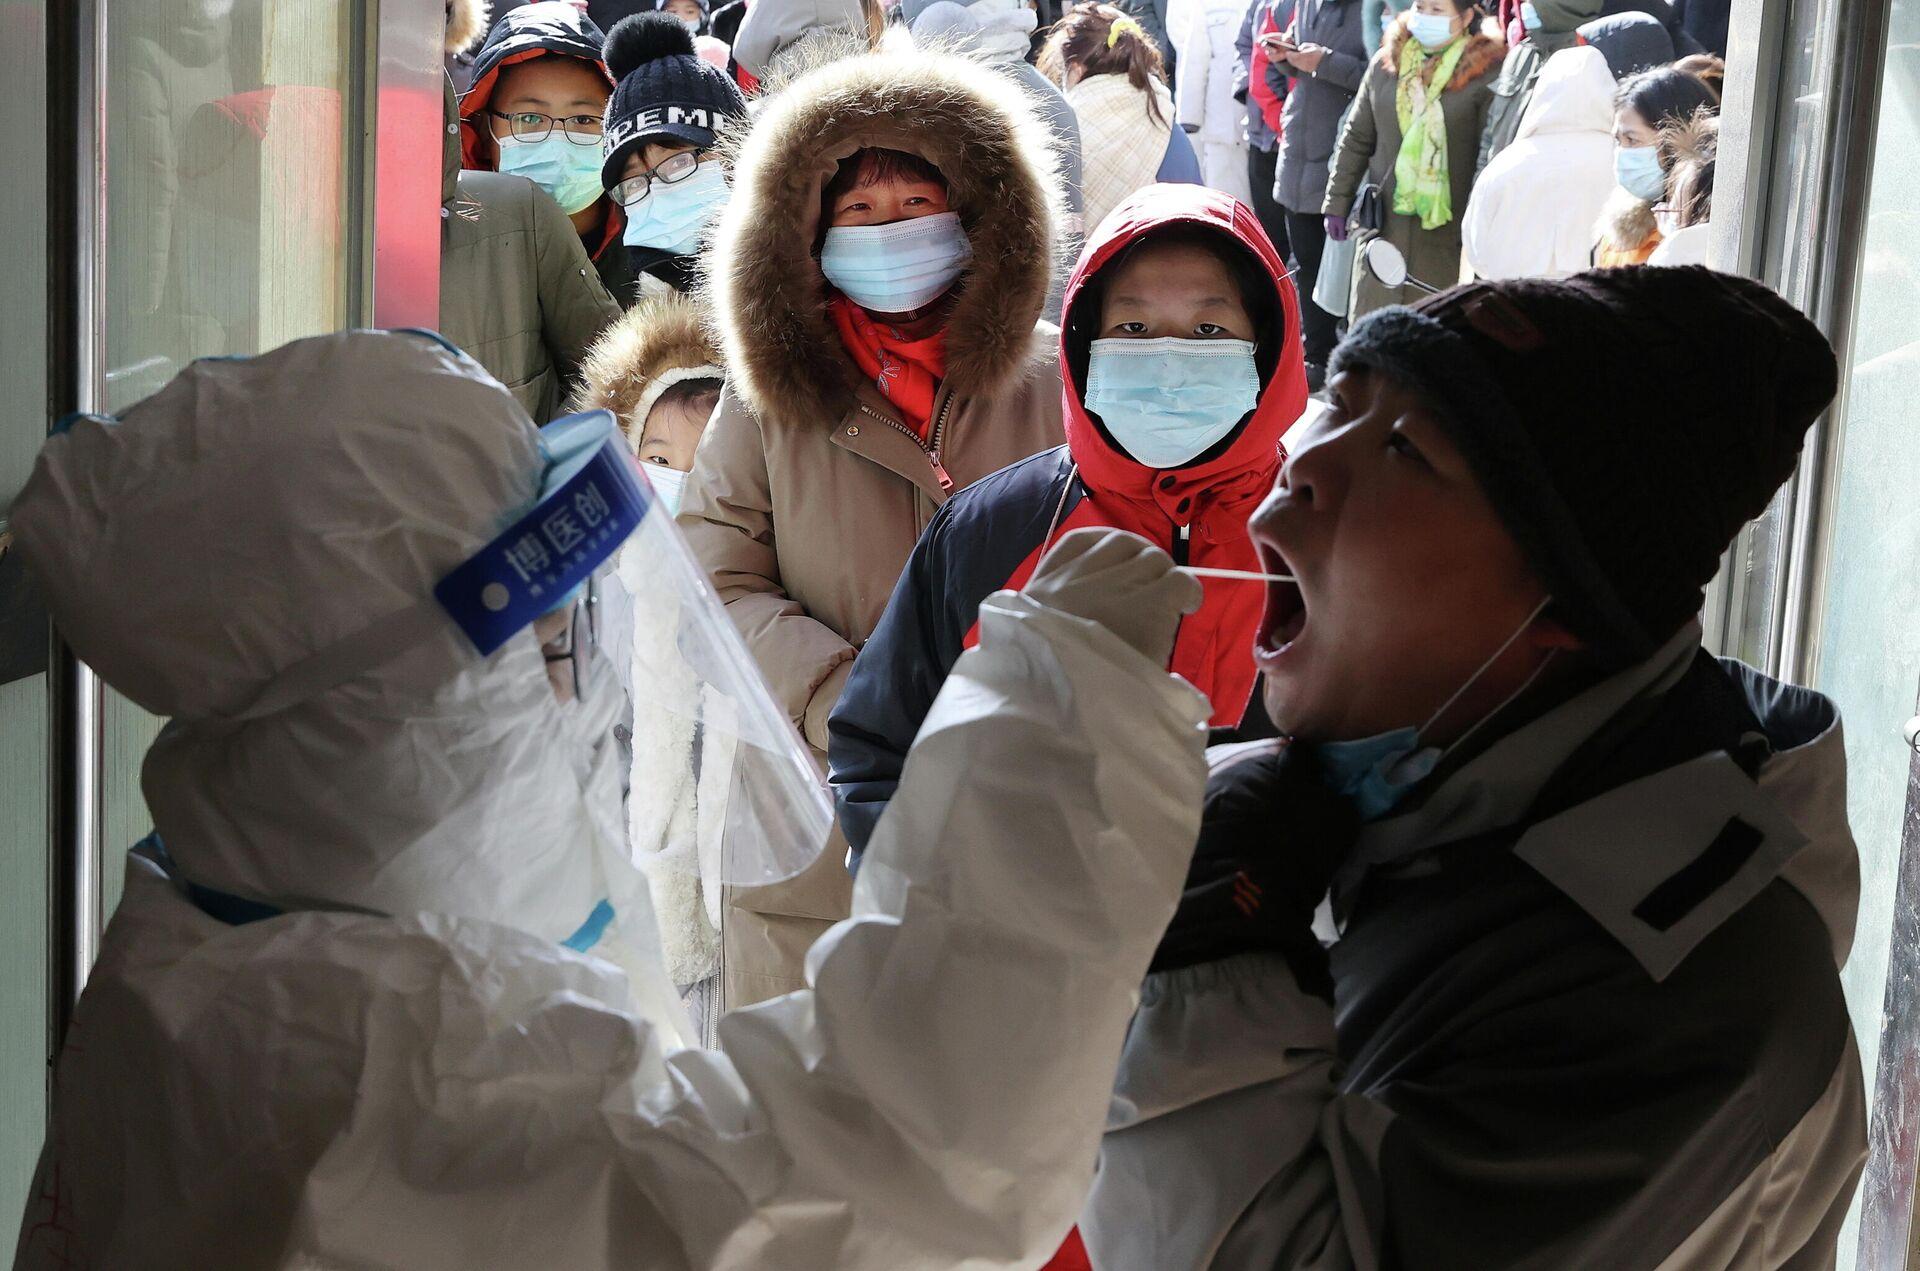 Тестирование на коронавирус в провинции Хэбэй в Китае  - РИА Новости, 1920, 15.01.2021